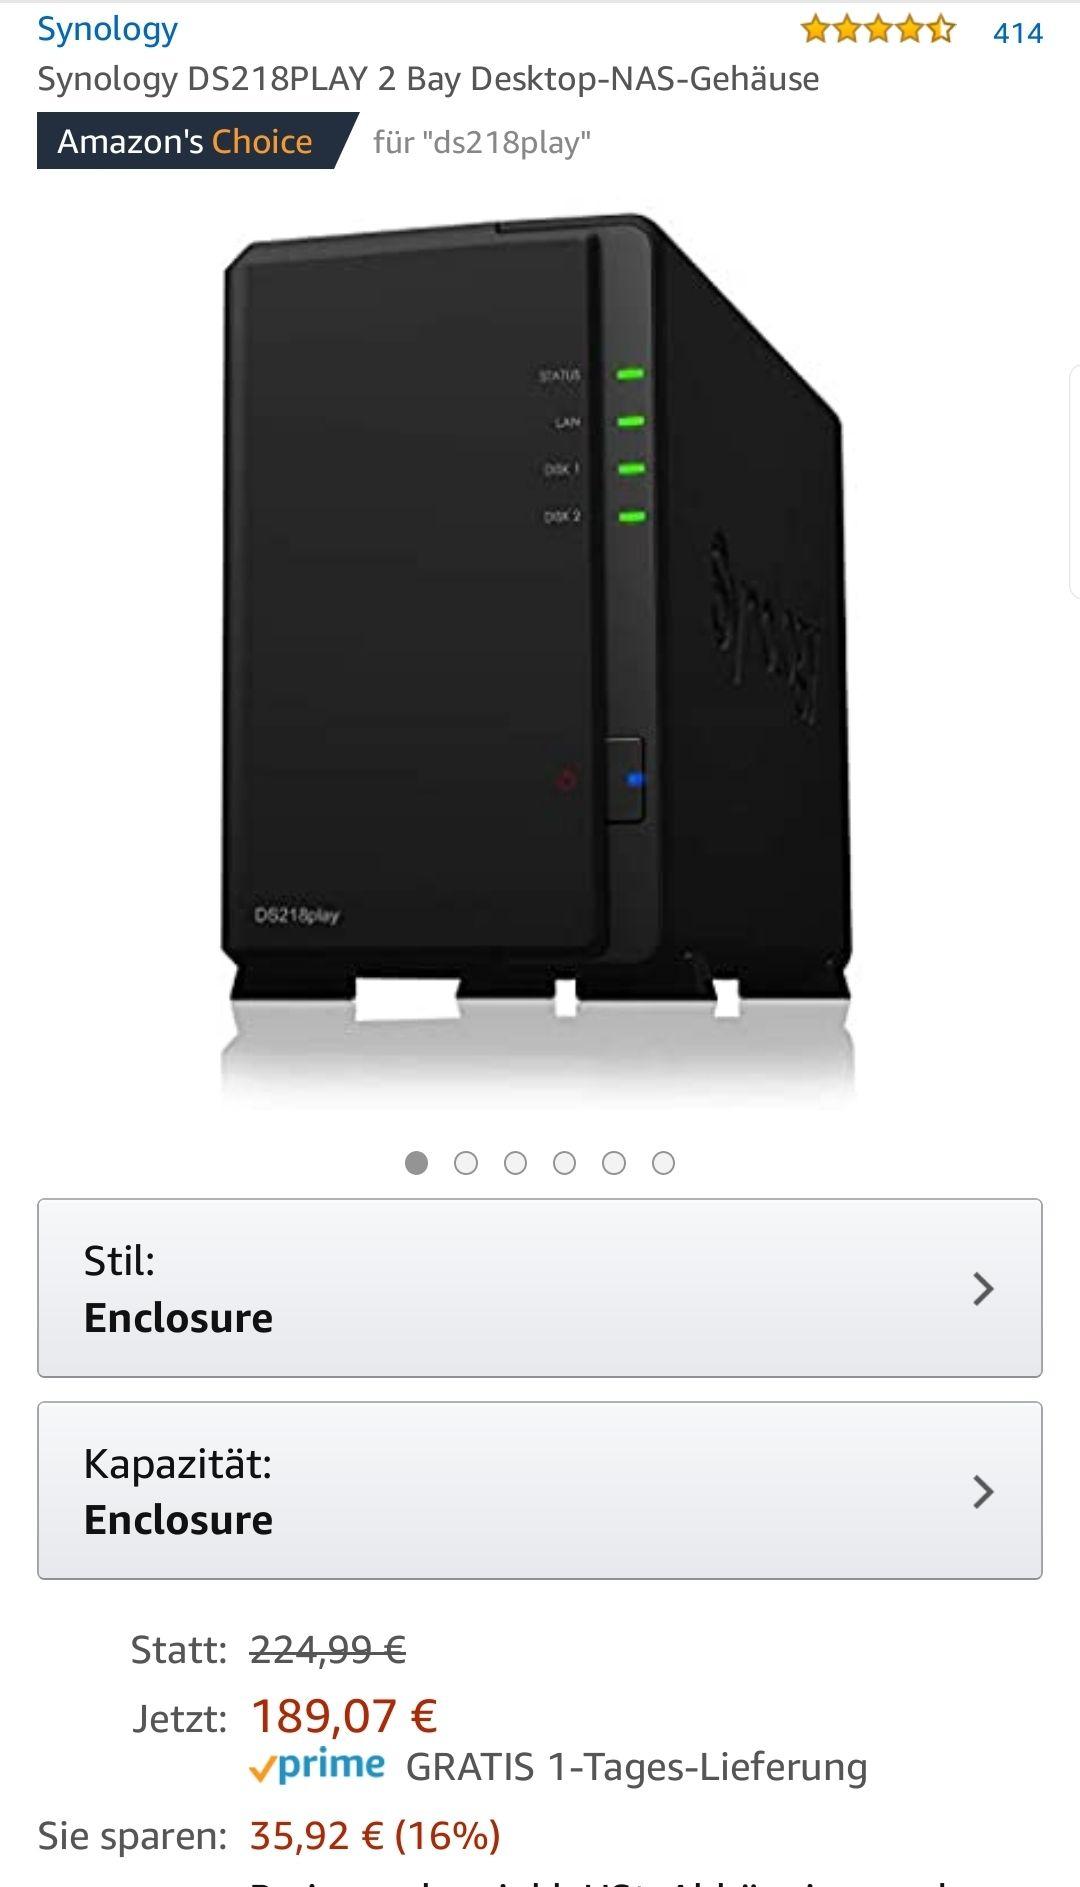 Synology DS218PLAY 2 Bay Desktop-NAS-Gehäuse